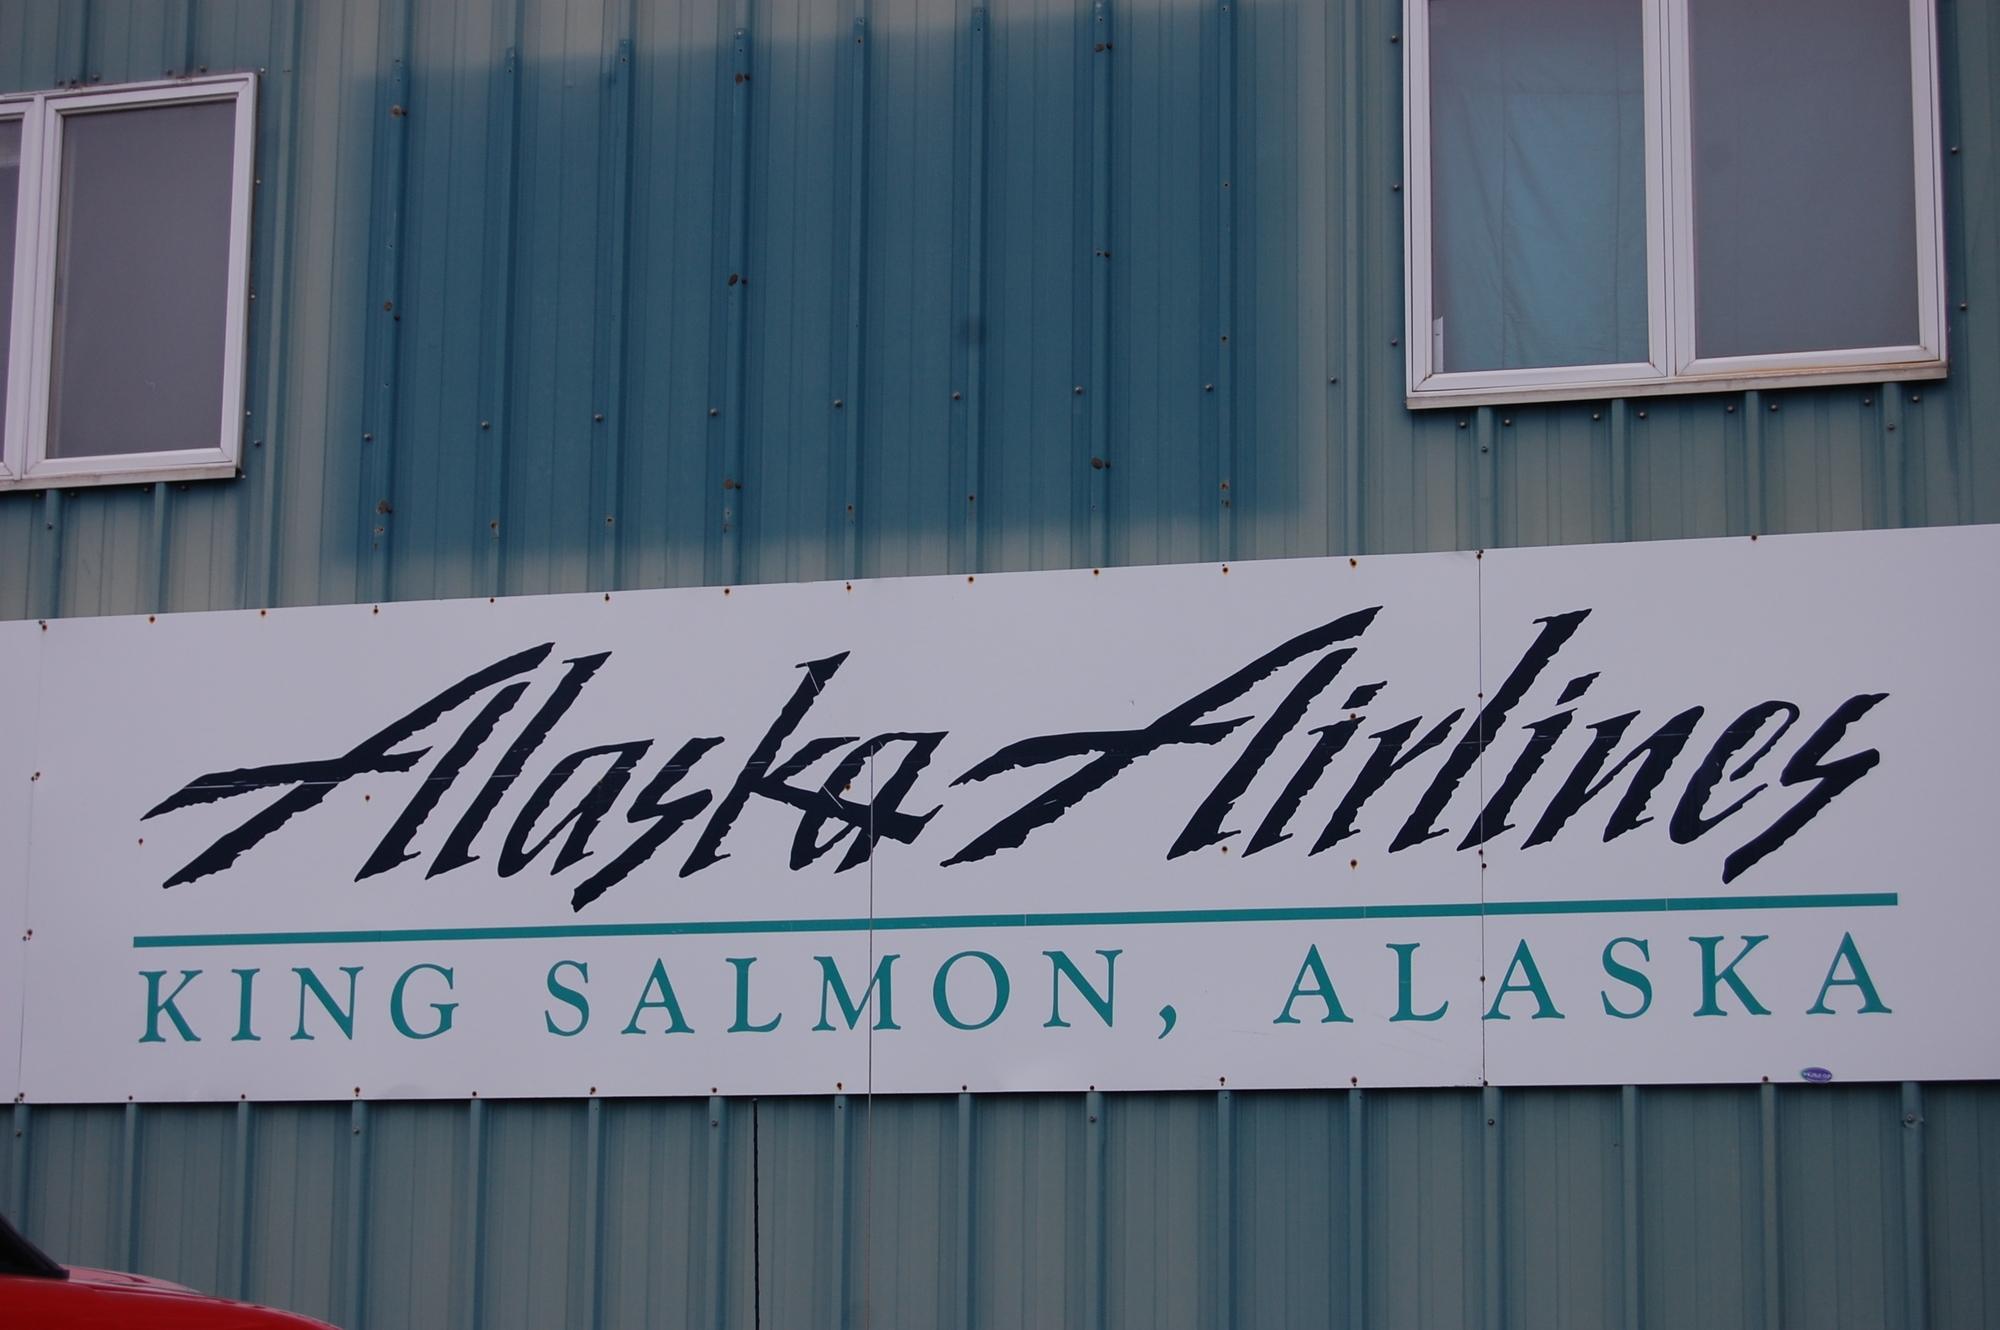 King Salmon airport (AKN)